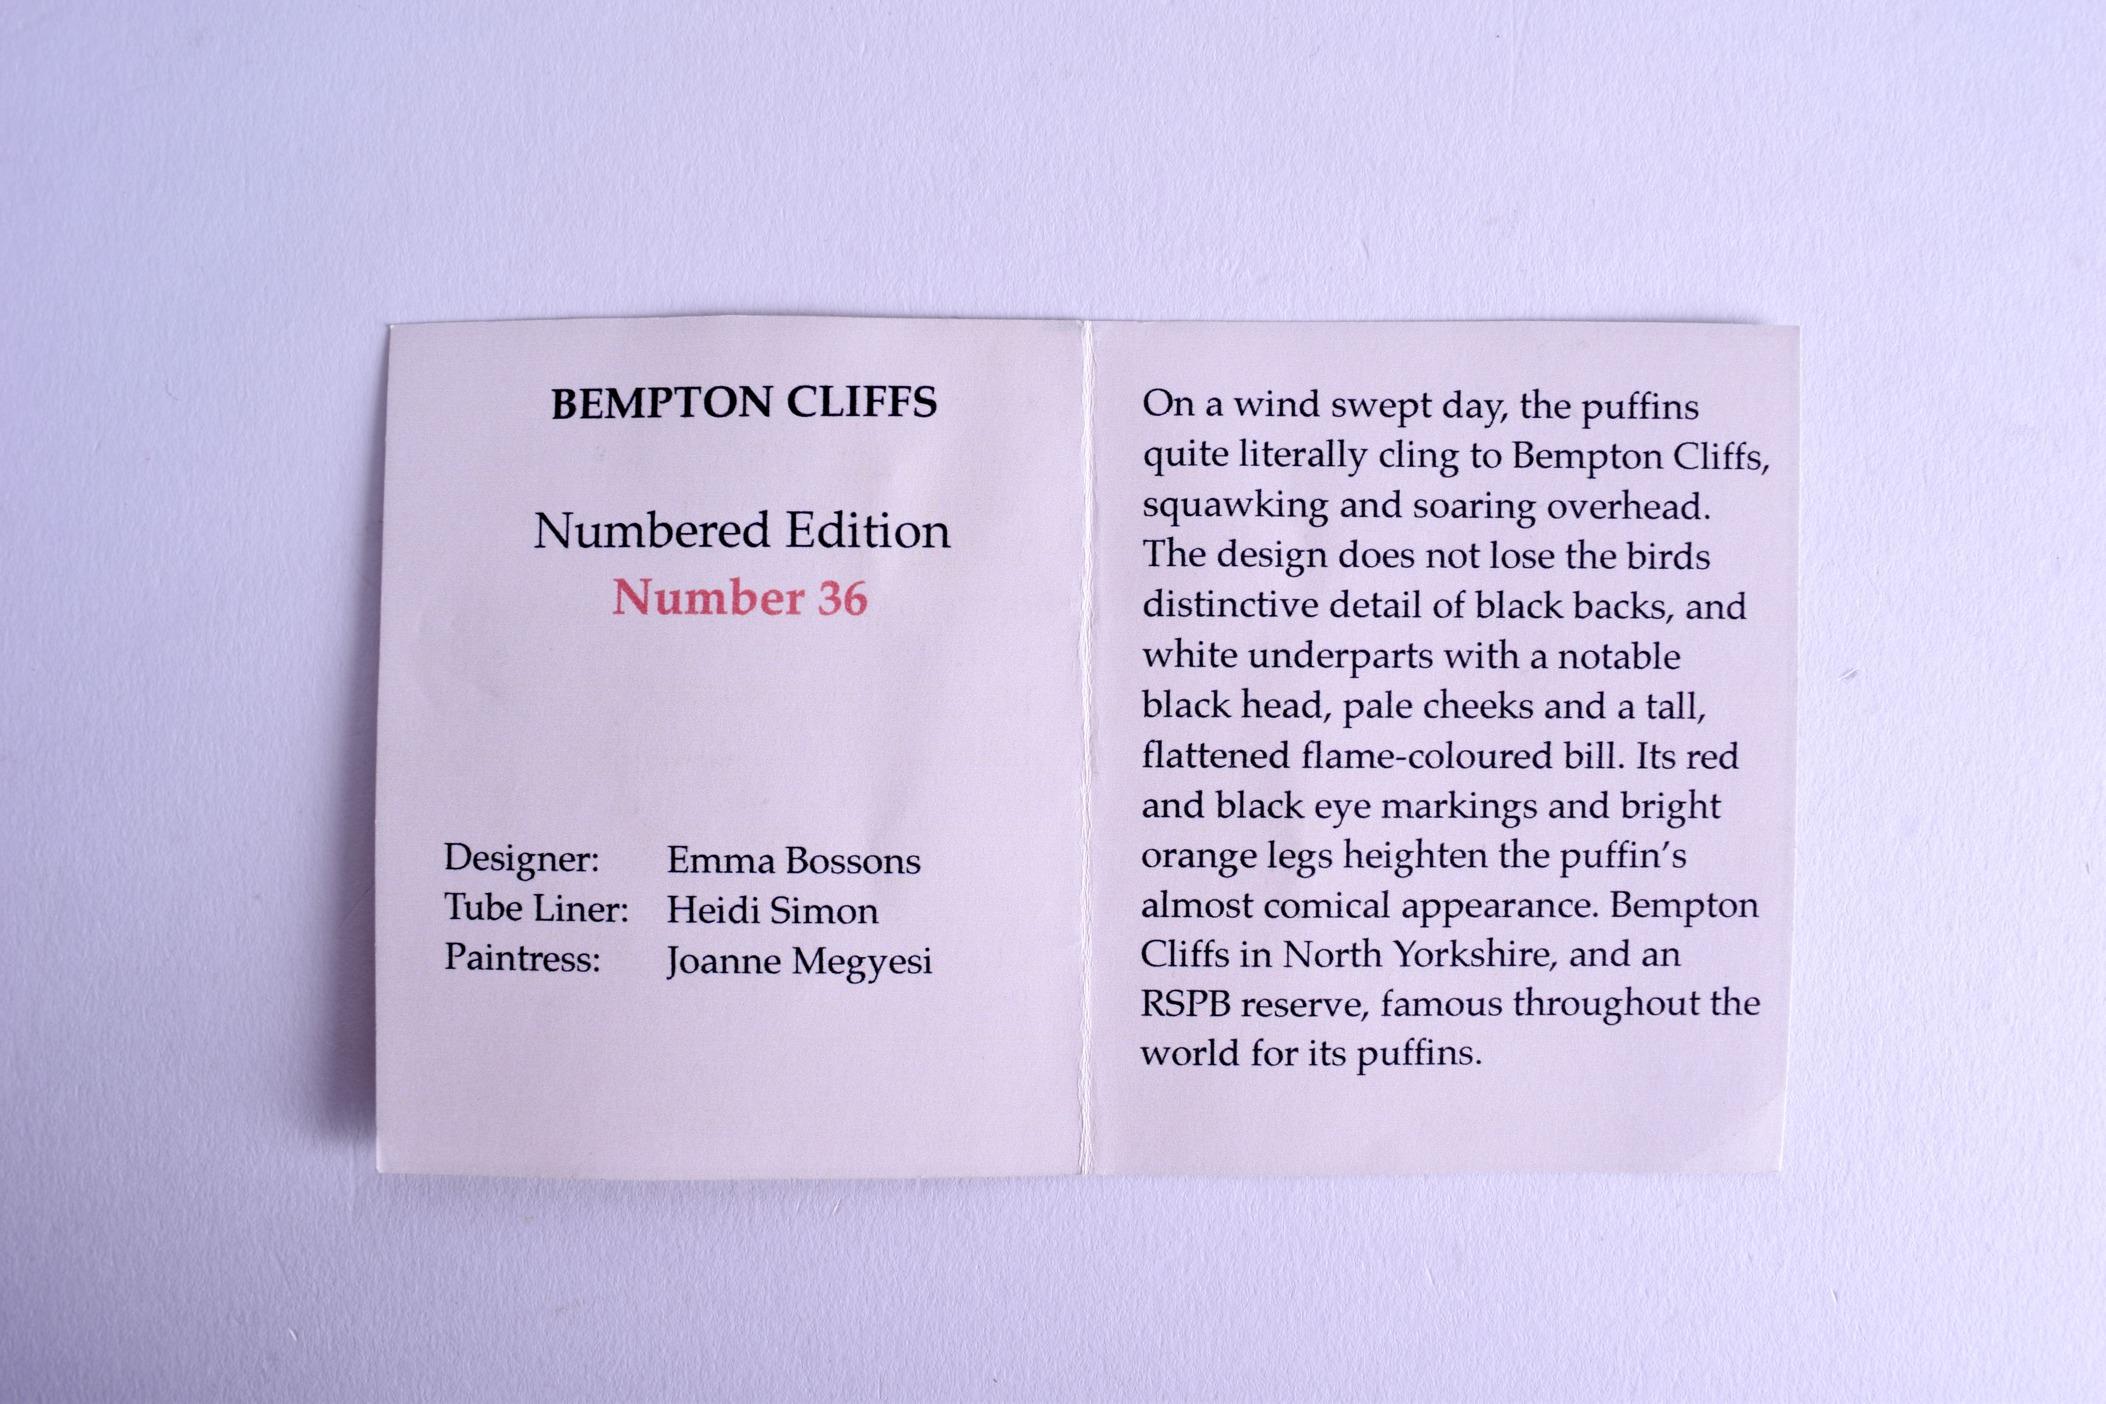 Lot 40 - A MOORCROFT 'BEMPTON CLIFFS' VASE designed by Emma Bossons. No 36. 14 cm wide.